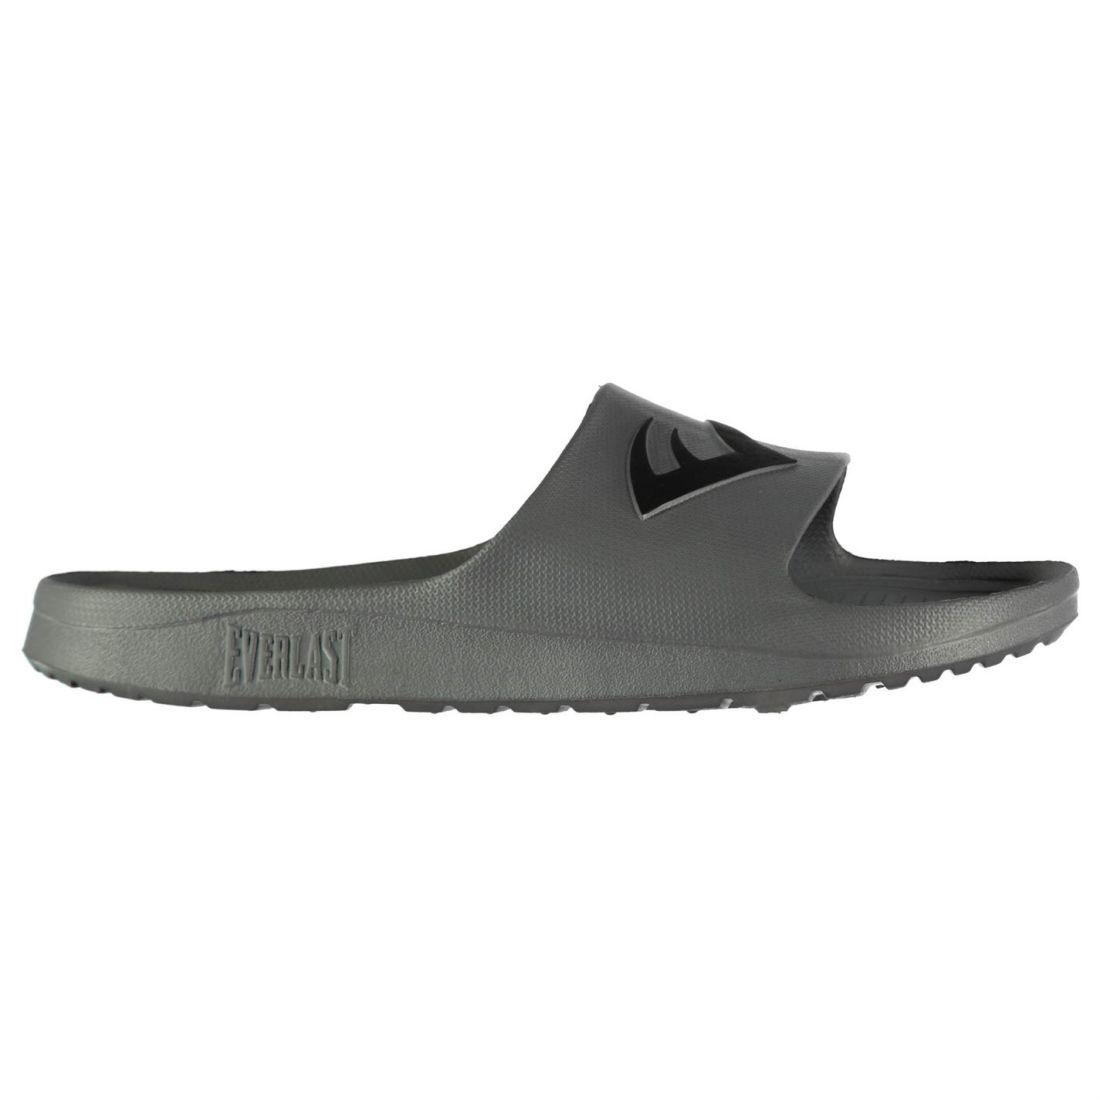 67fbdd32d42bd9 Everlast Kids Junior Sliders Pool Shoes Slip On Comfortable Fit ...